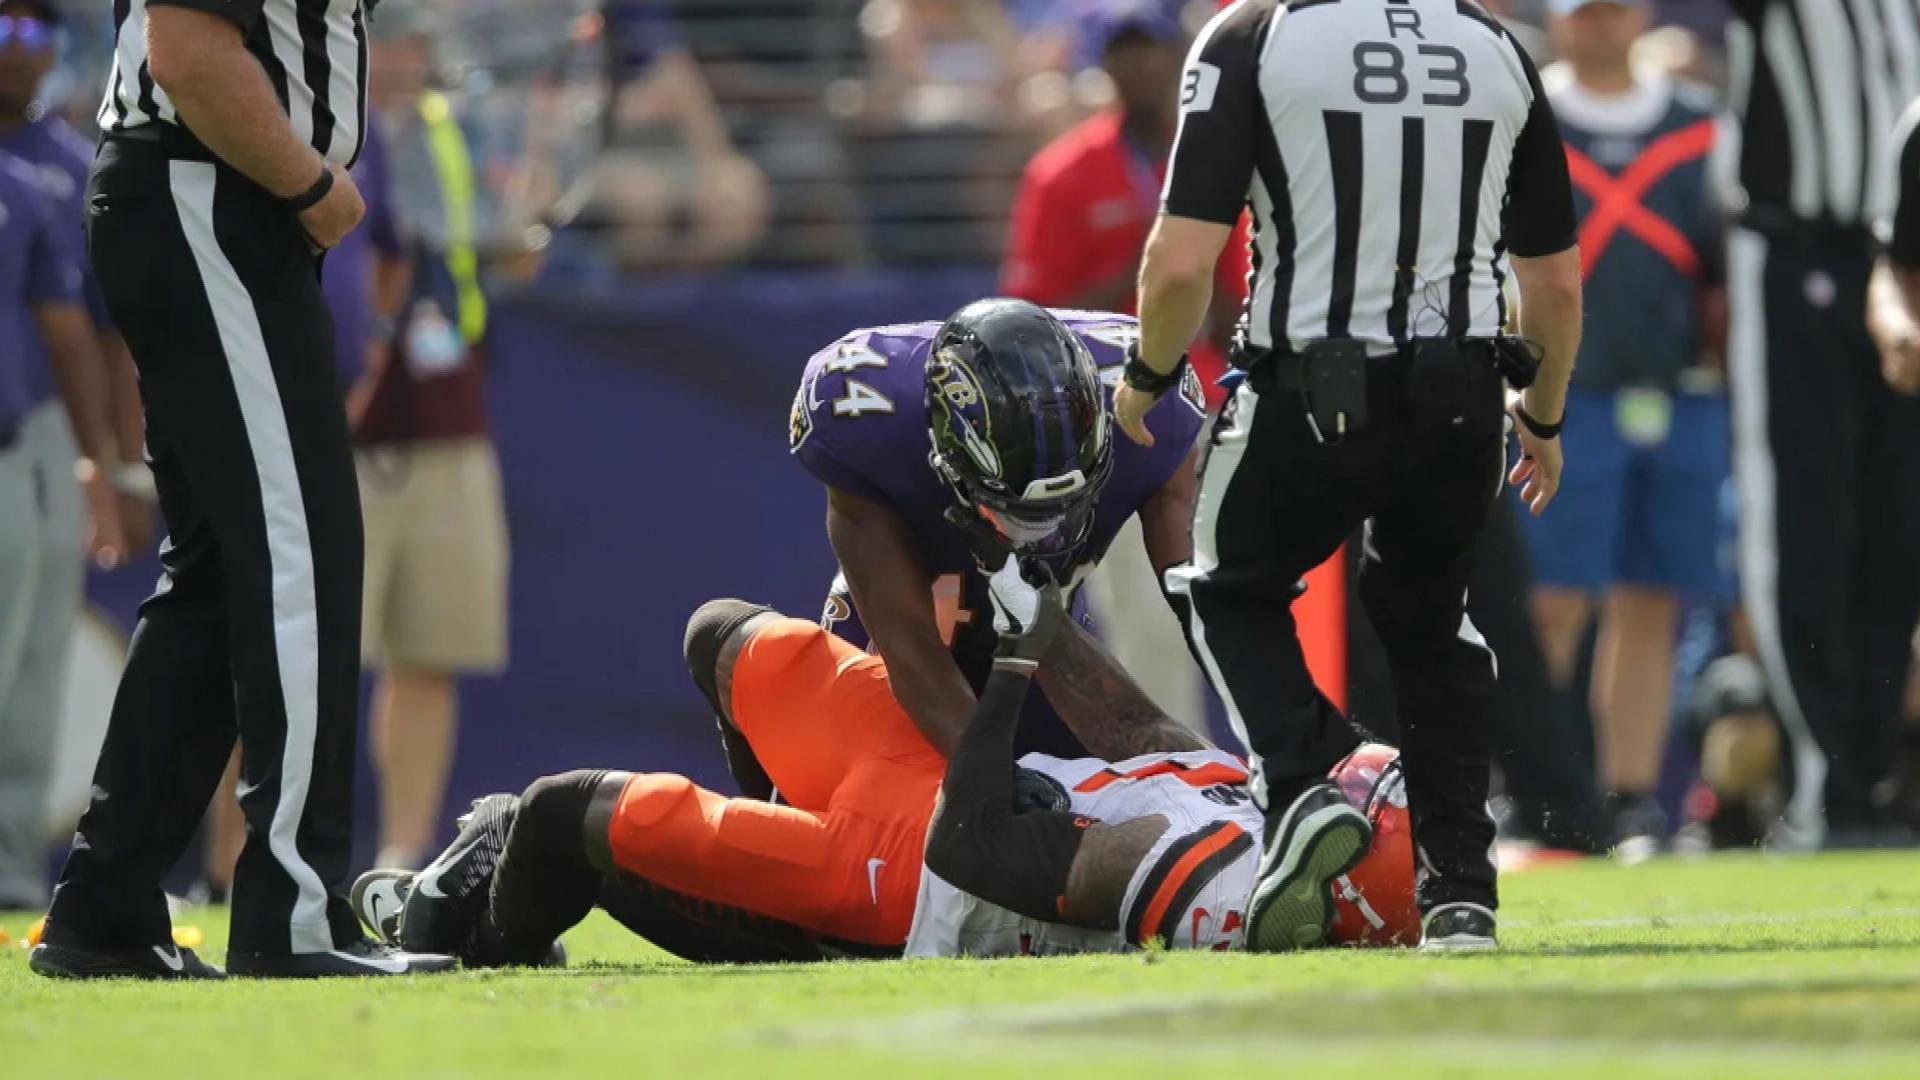 Freddie Kitchens still upset with Ravens' Marlon Humphrey for choking